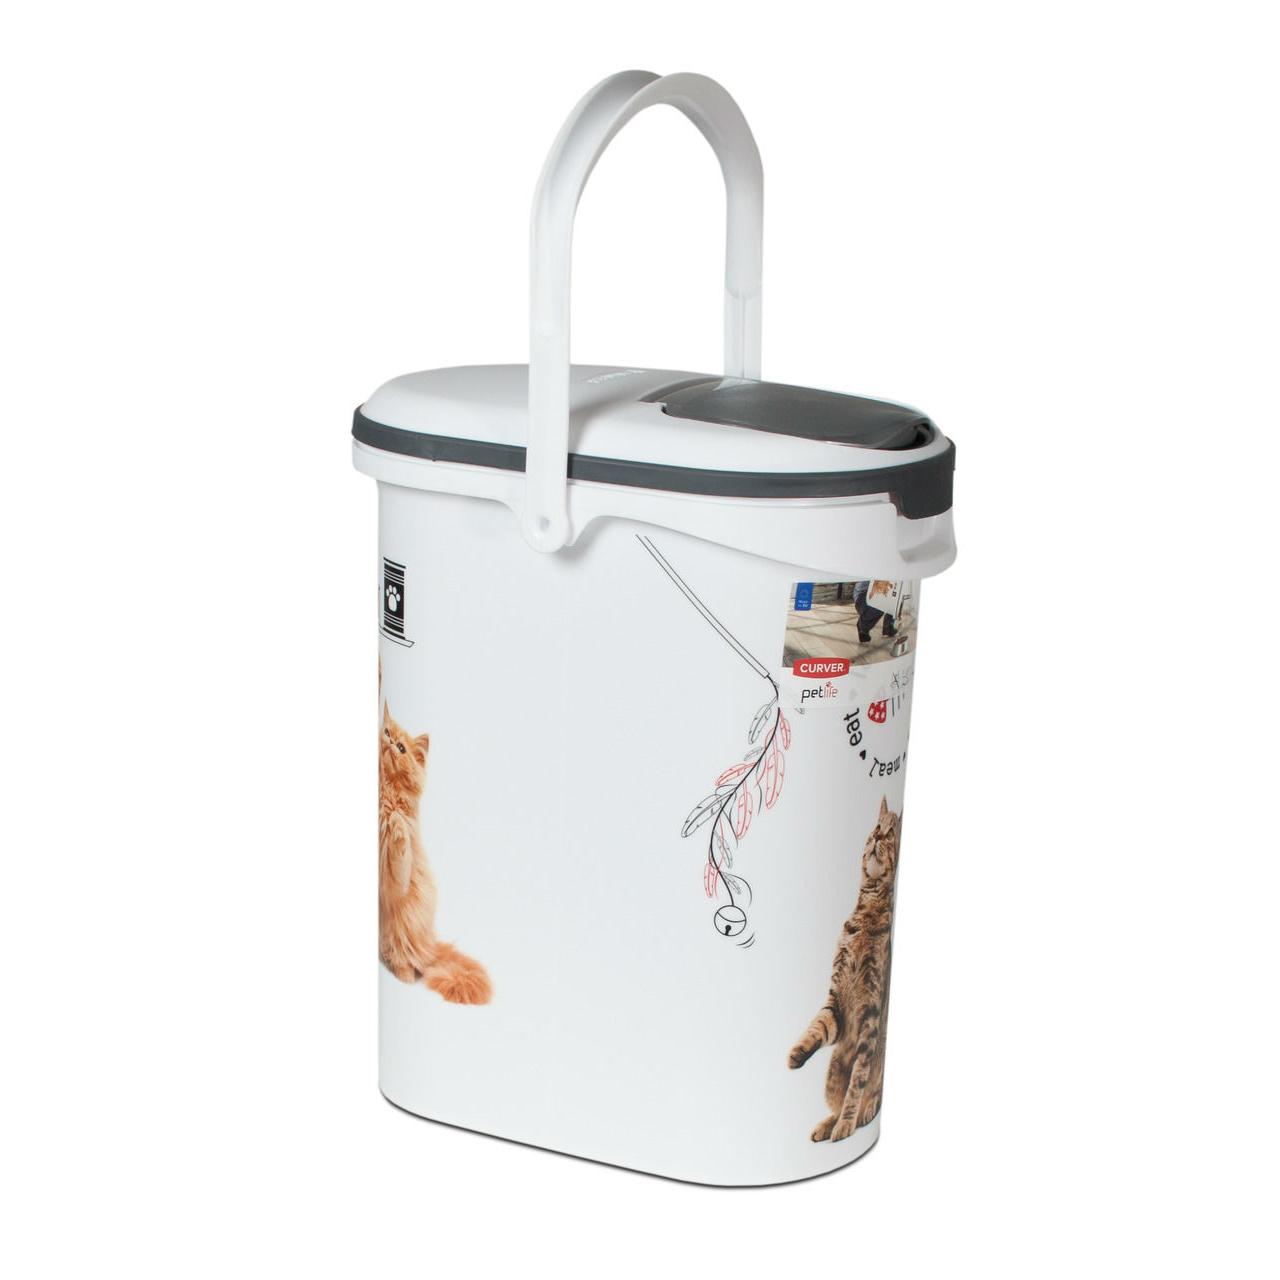 Curver Futtercontainer Katze, Bild 5